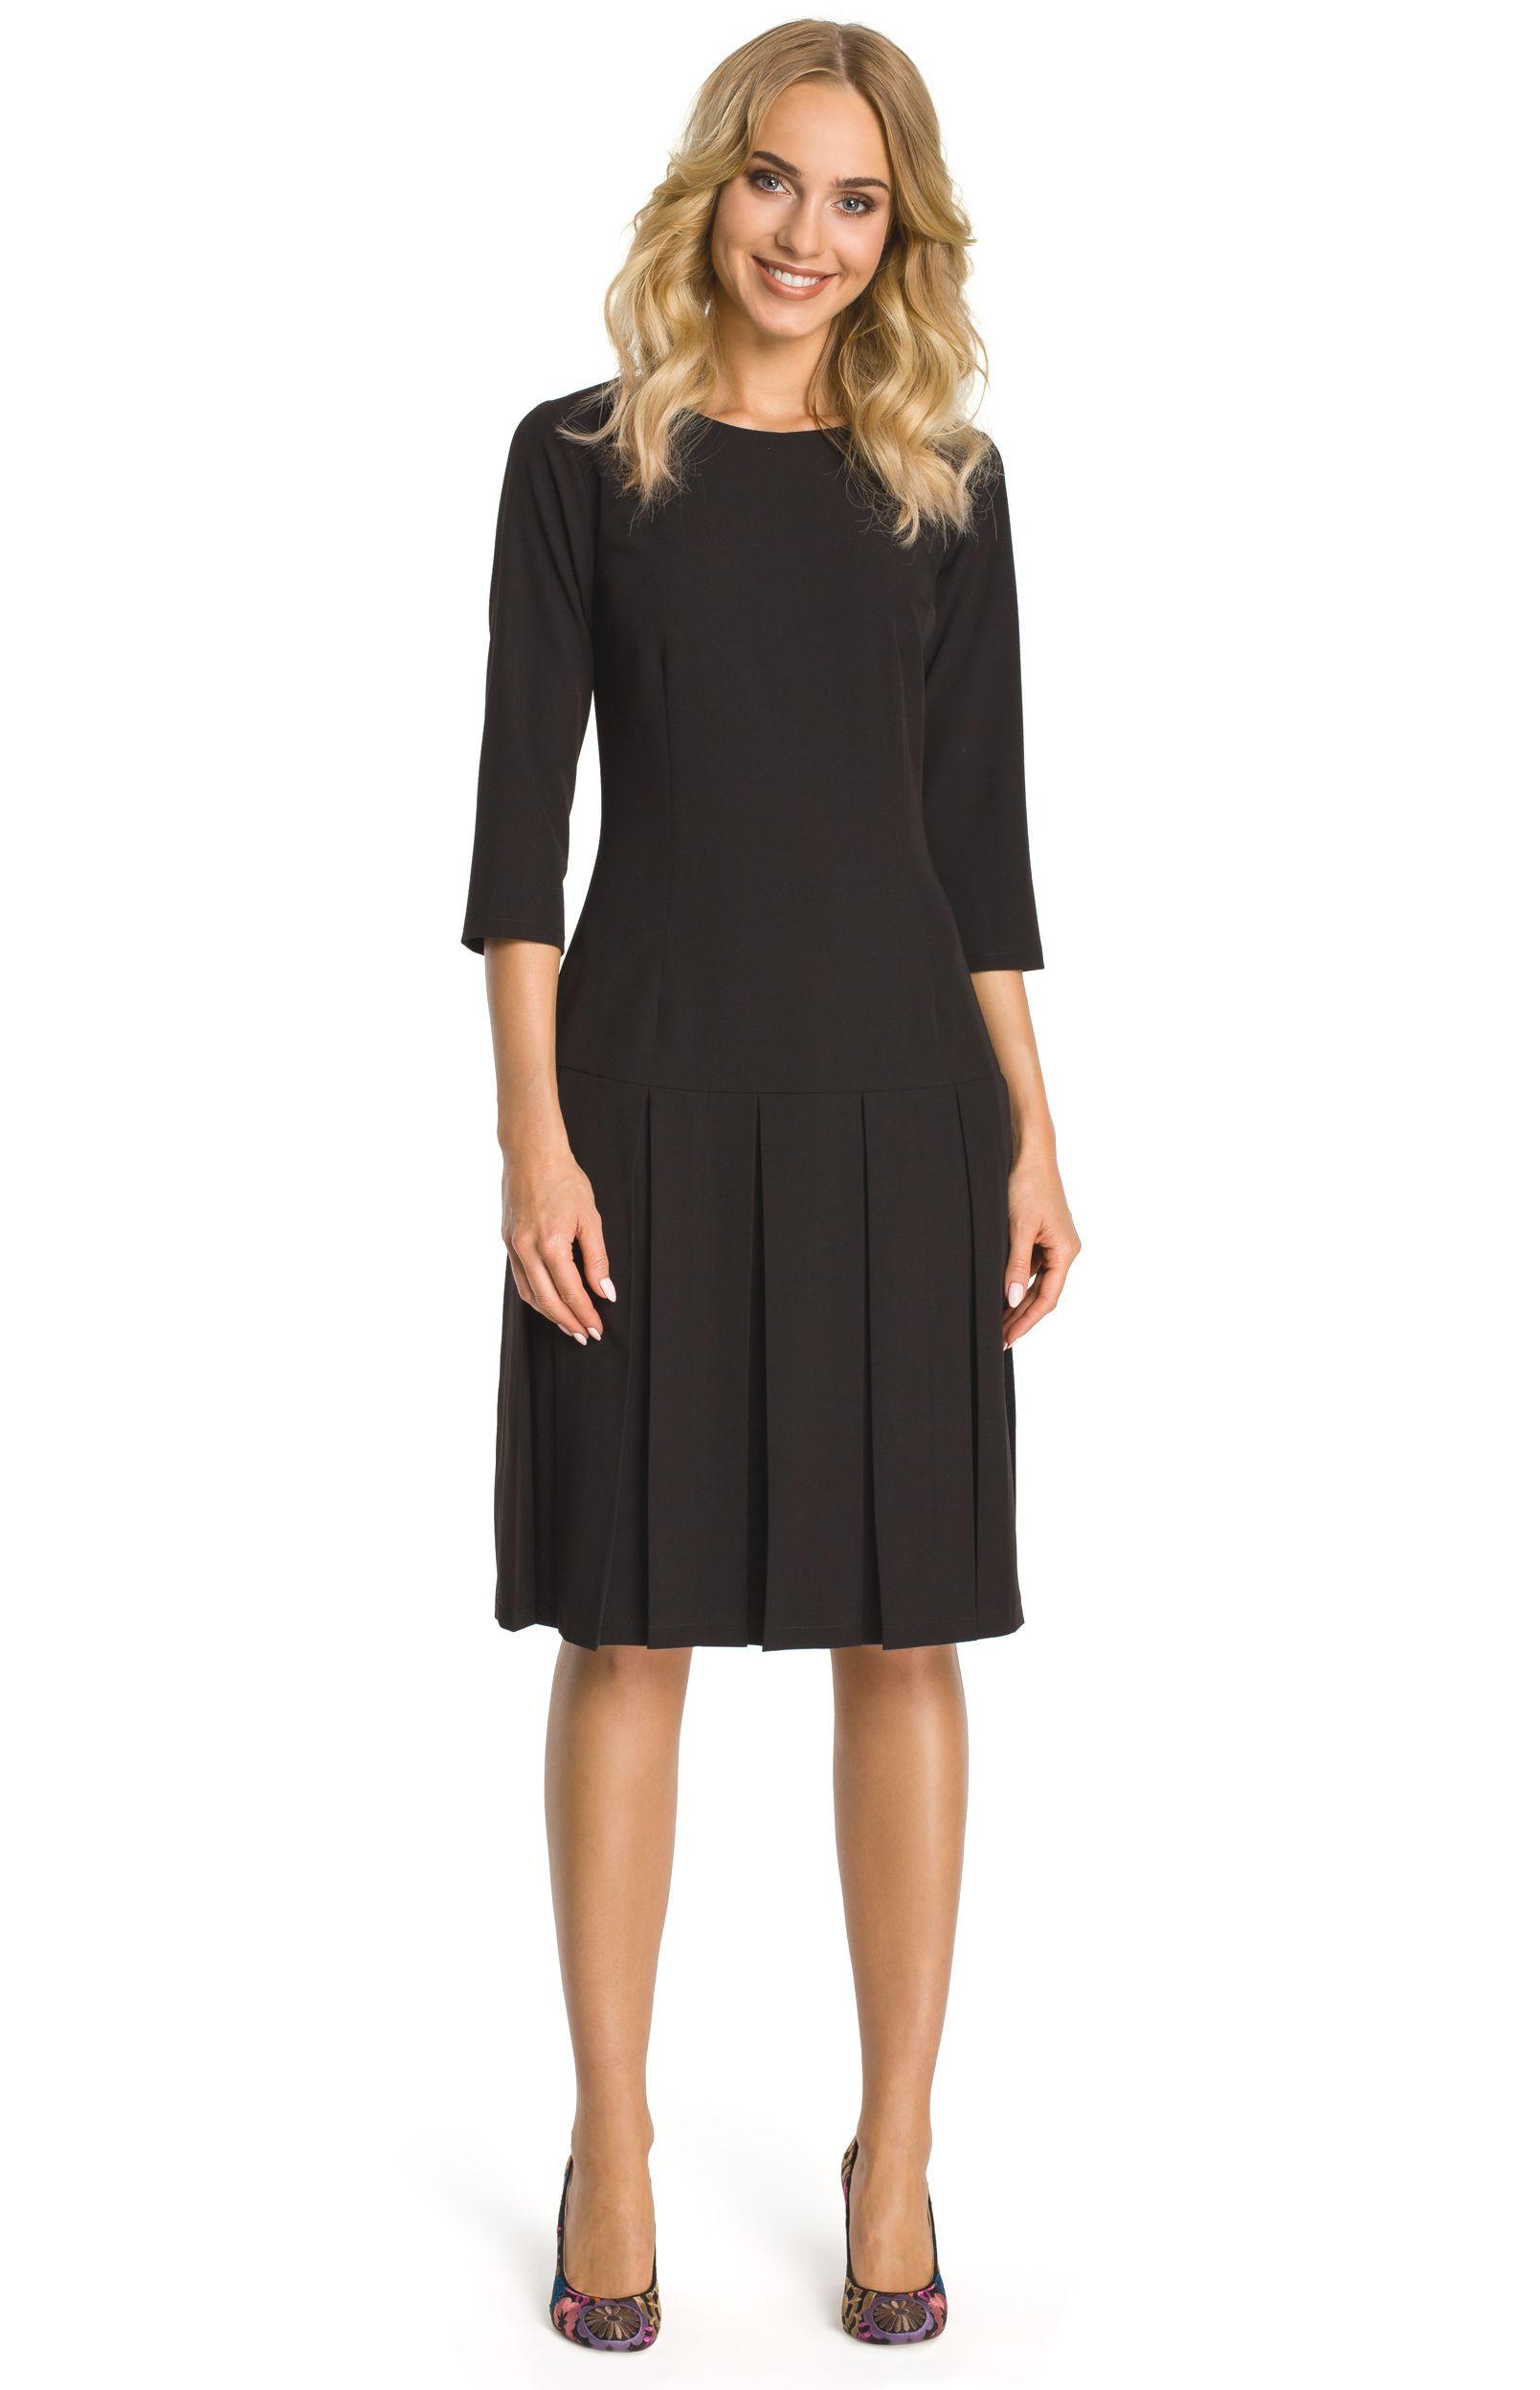 robe noir manche 3/4